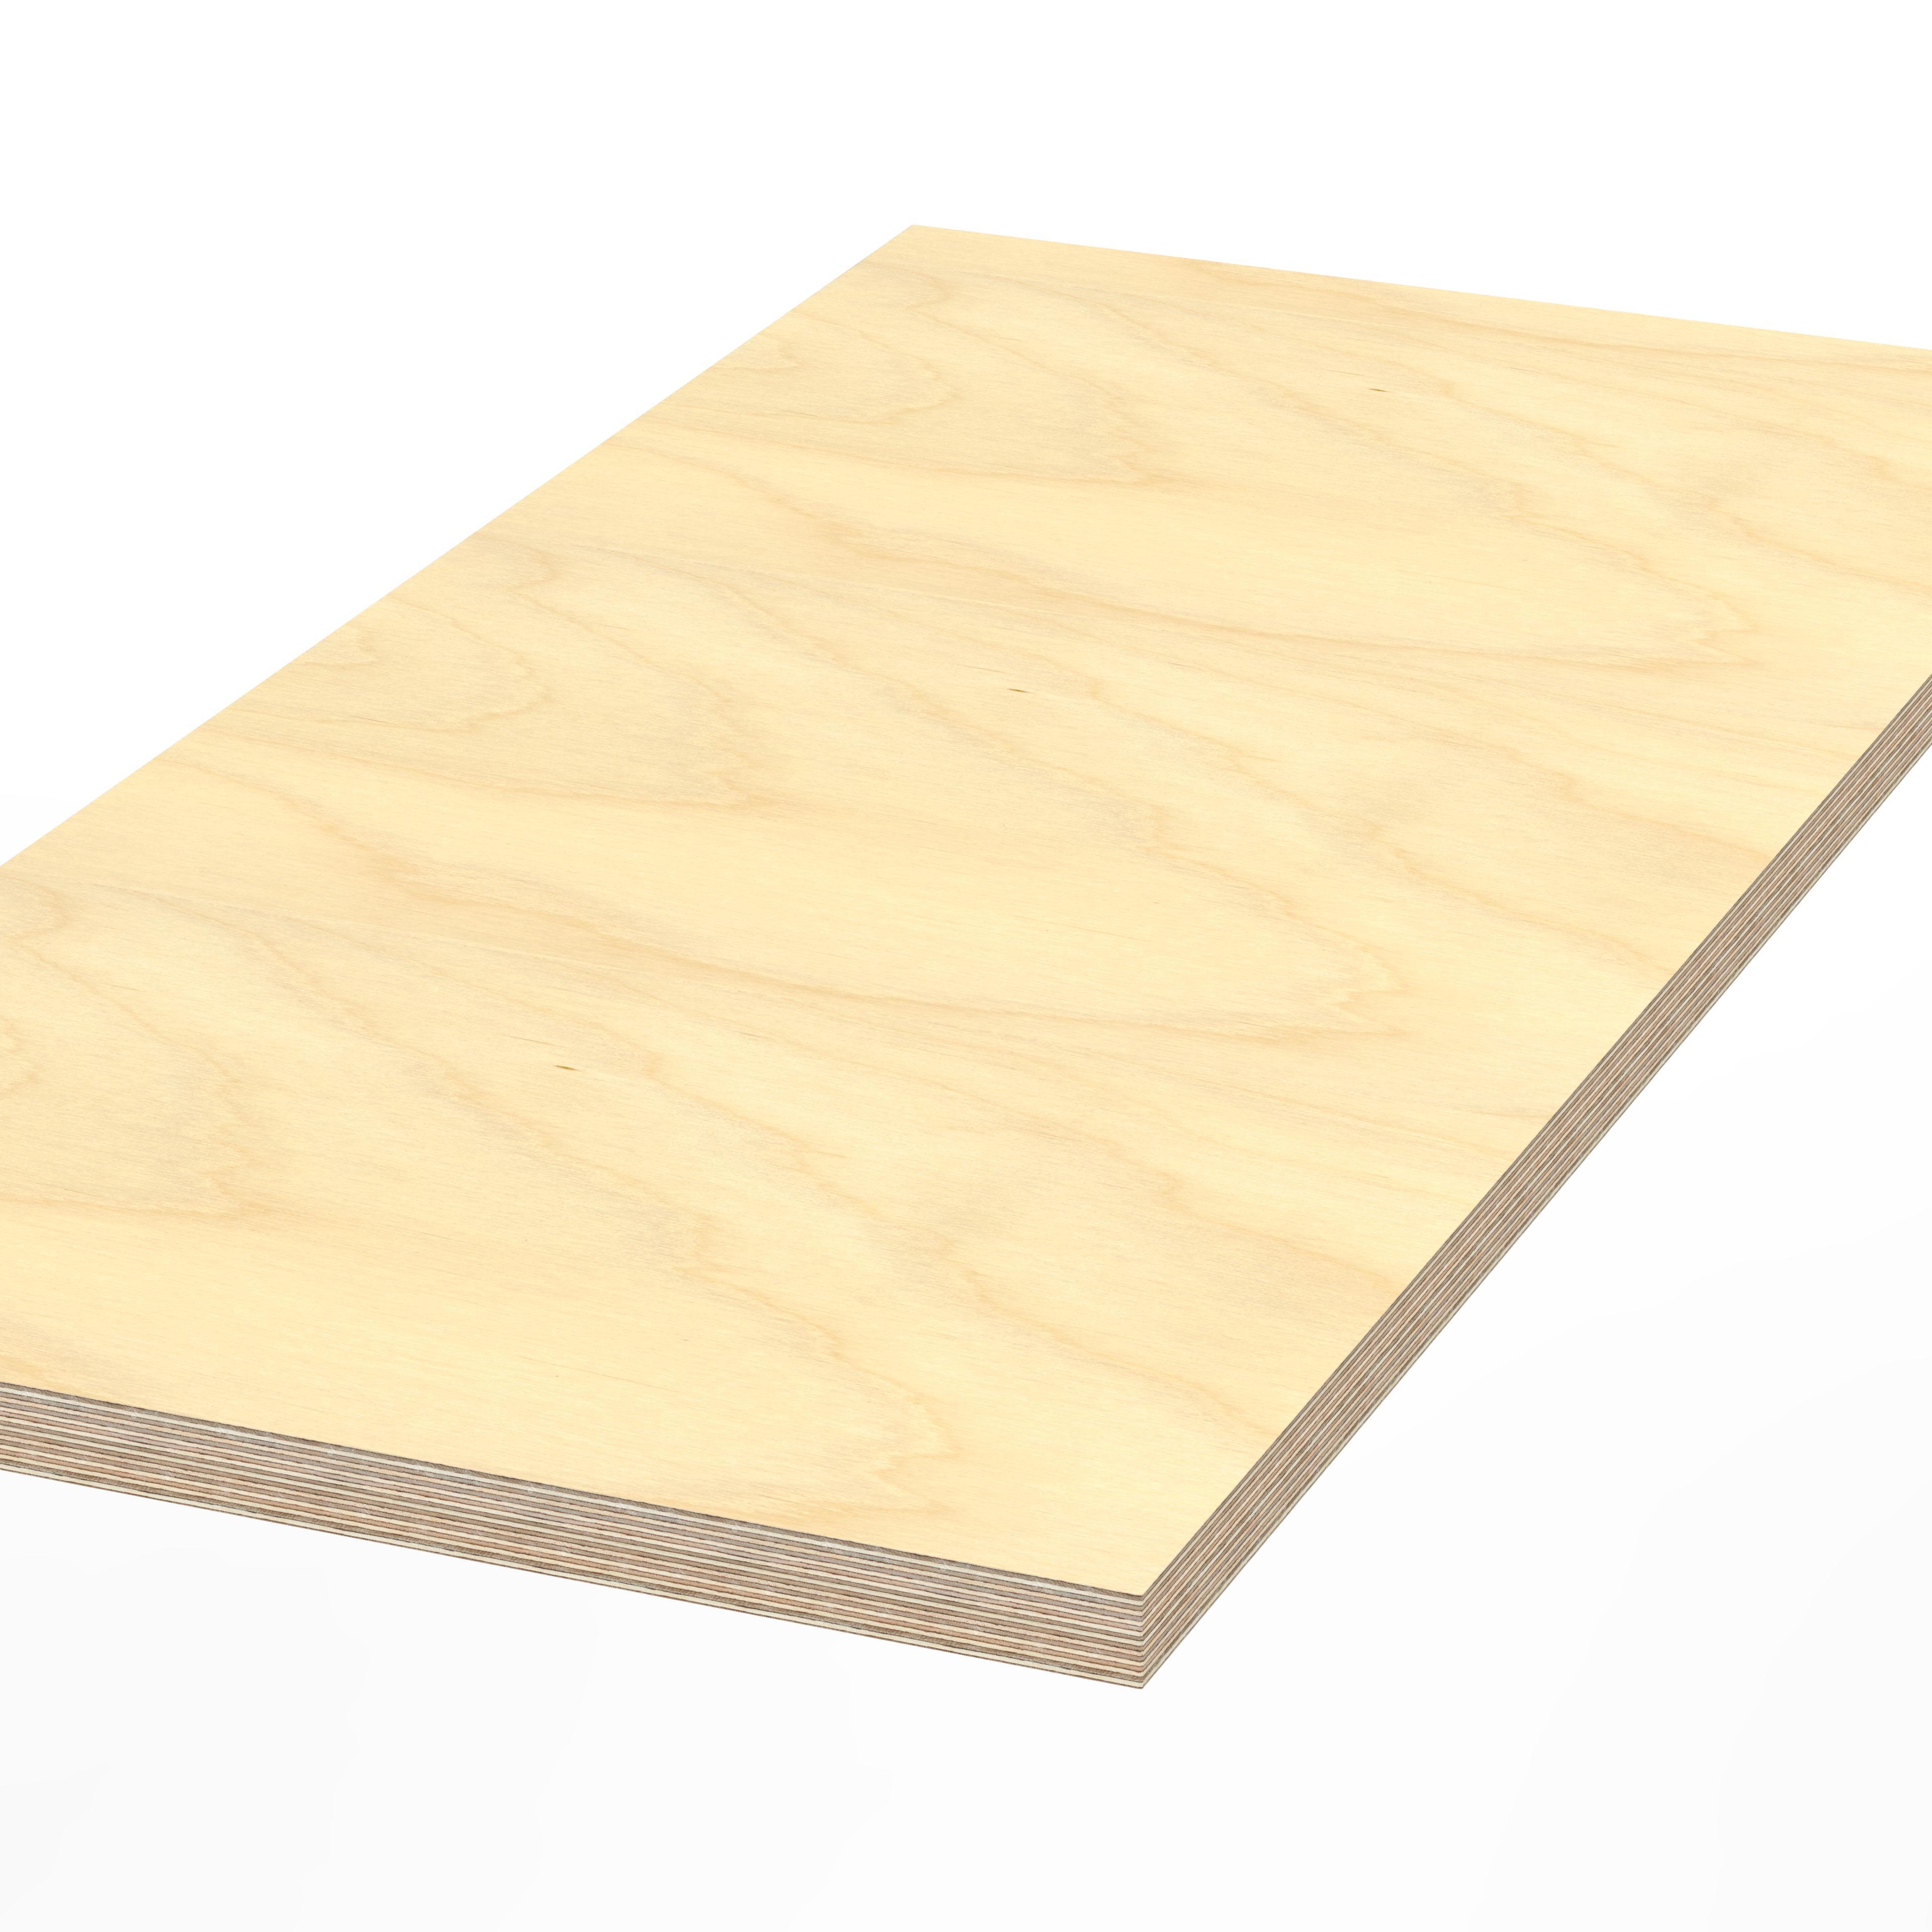 werkbankplatte 3000 x 750 x 30 mm multiplex platte geschliffen ge lt. Black Bedroom Furniture Sets. Home Design Ideas